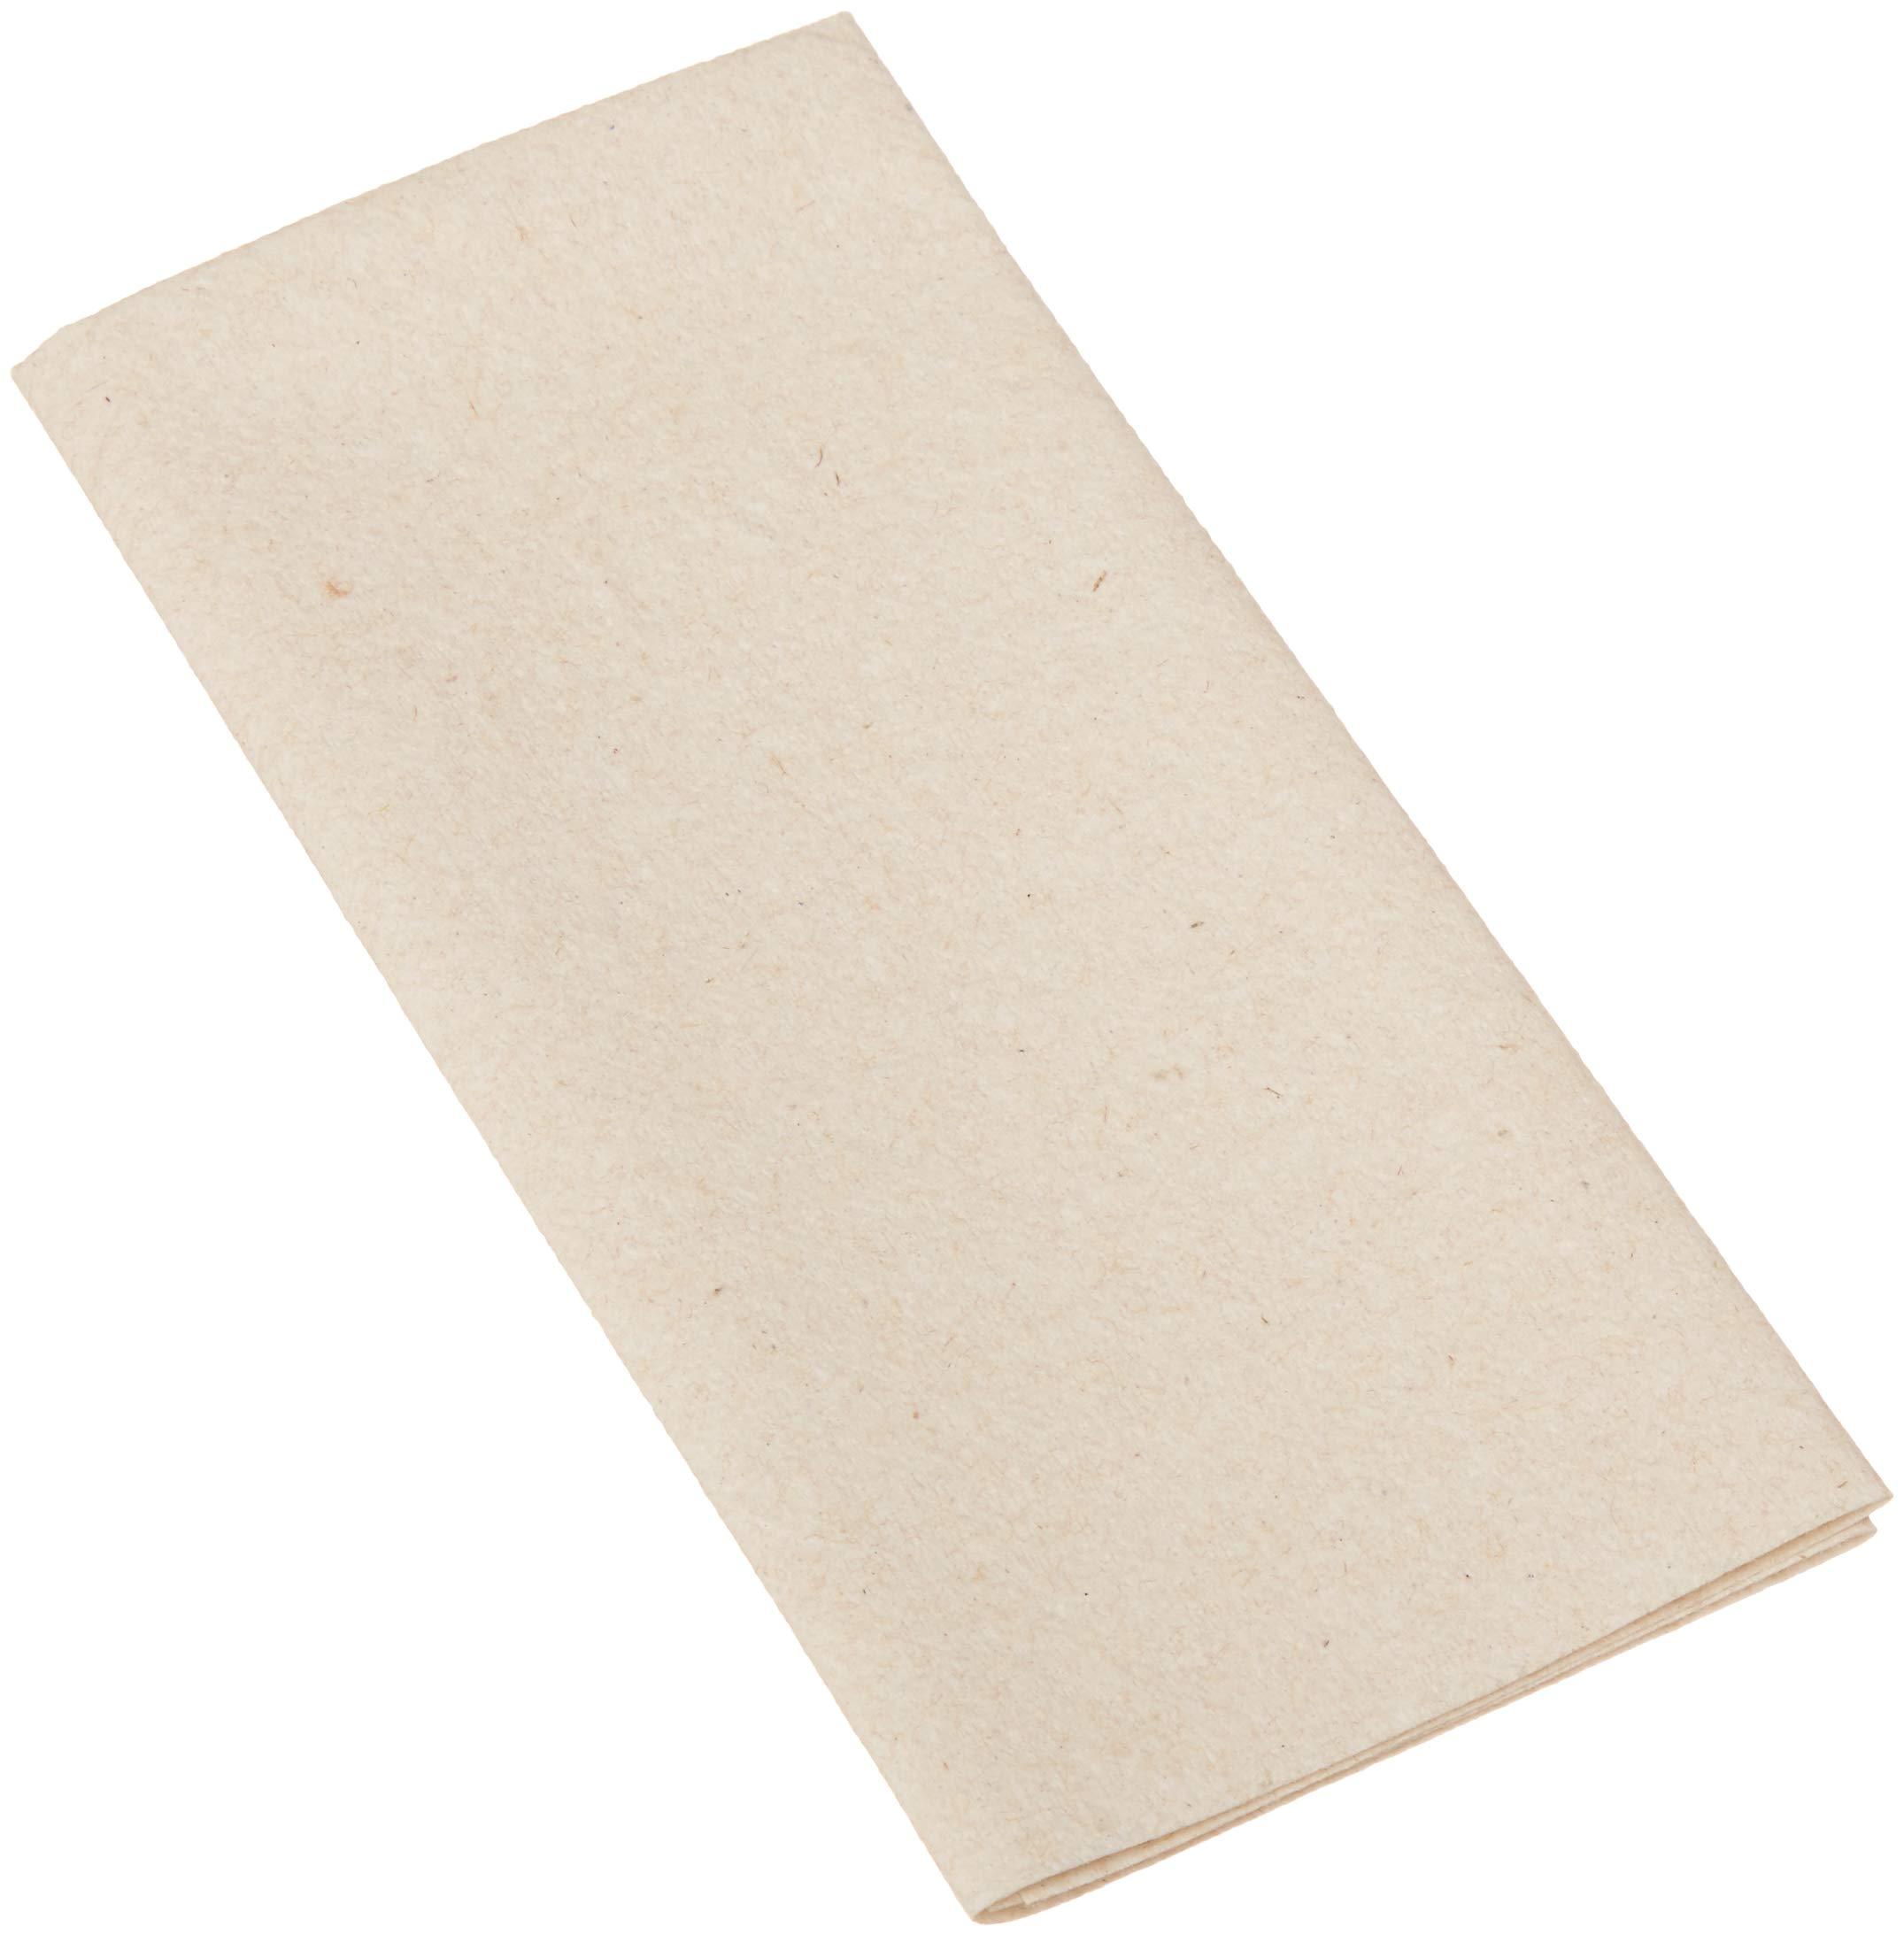 AmazonBasics Linen-Feel Napkin, Flat Pack, 14.5'' x 14.5'', Natural, 1000-Count